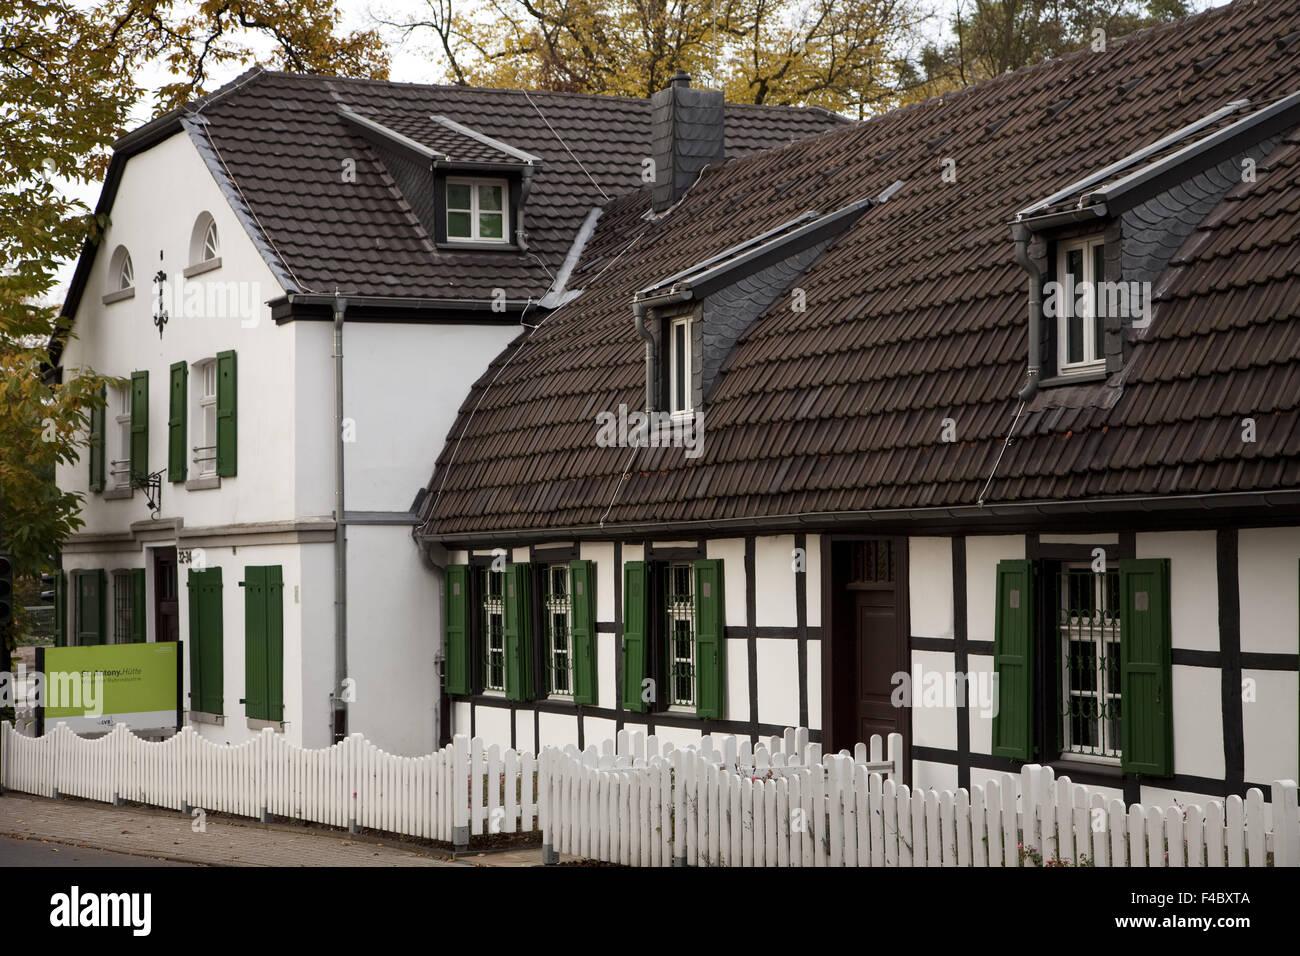 St. Antony hut, Oberhausen, Germany - Stock Image